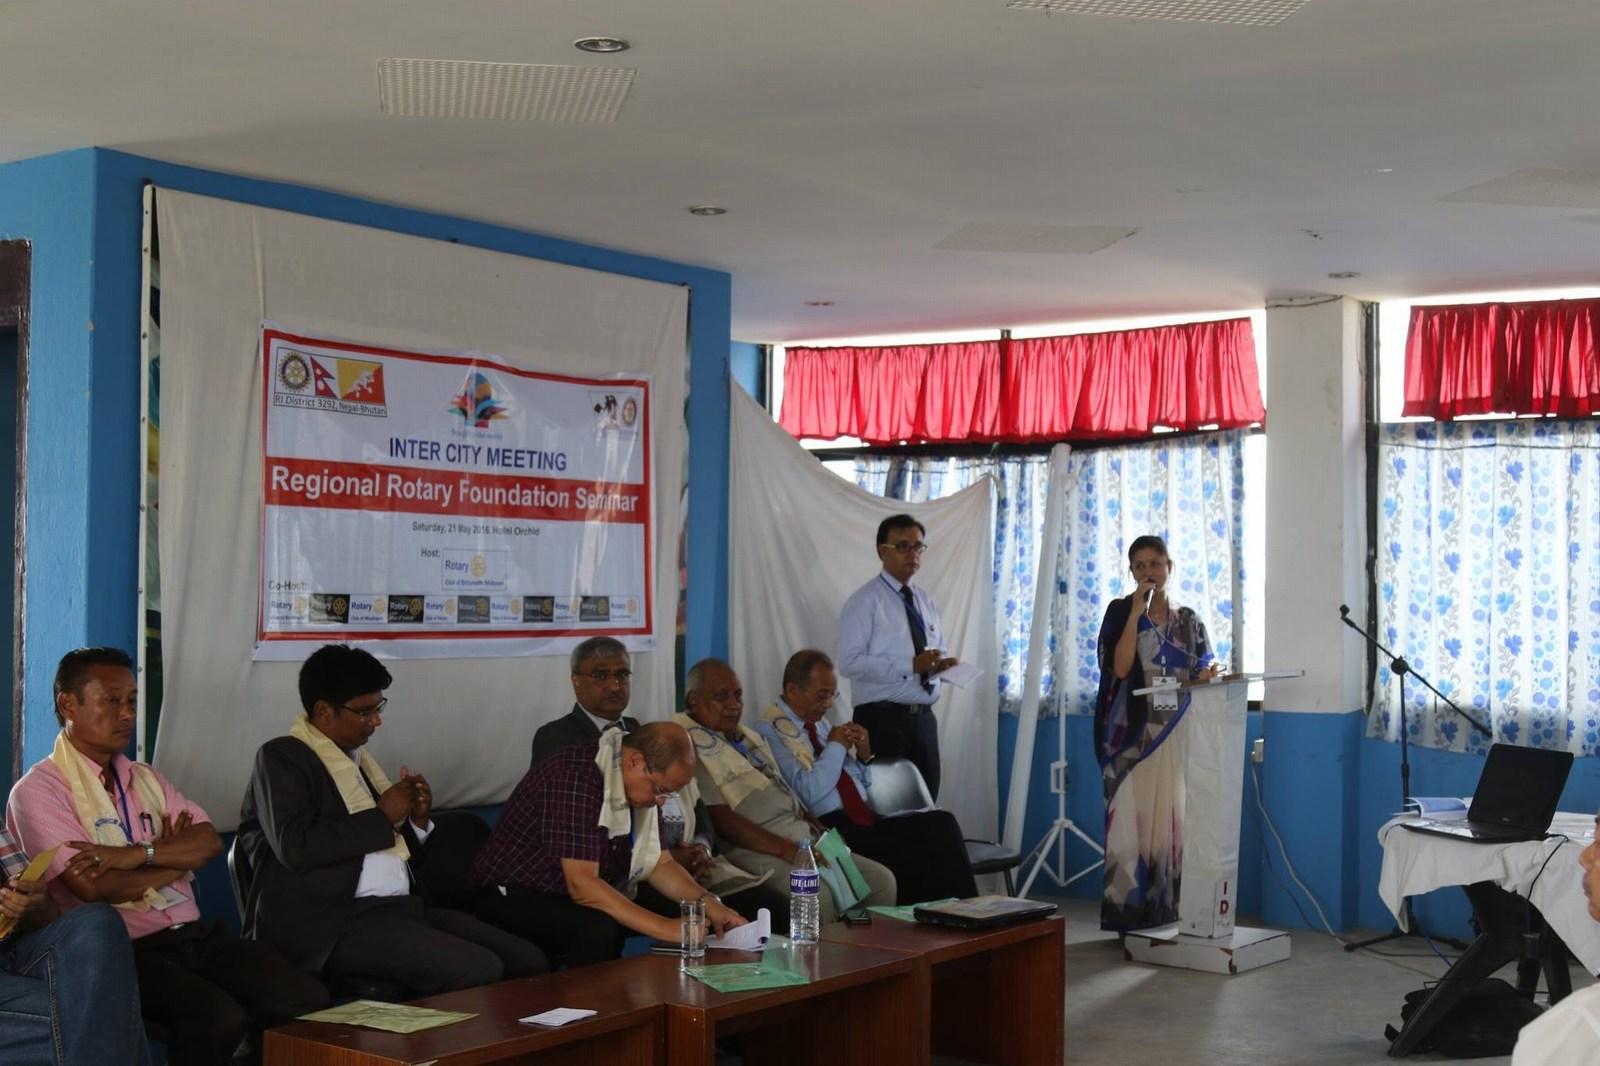 Regional-Rotary-Foundation-Seminar-Intercity-Meeting-Rotary-Club-of-Kakarvitta-21